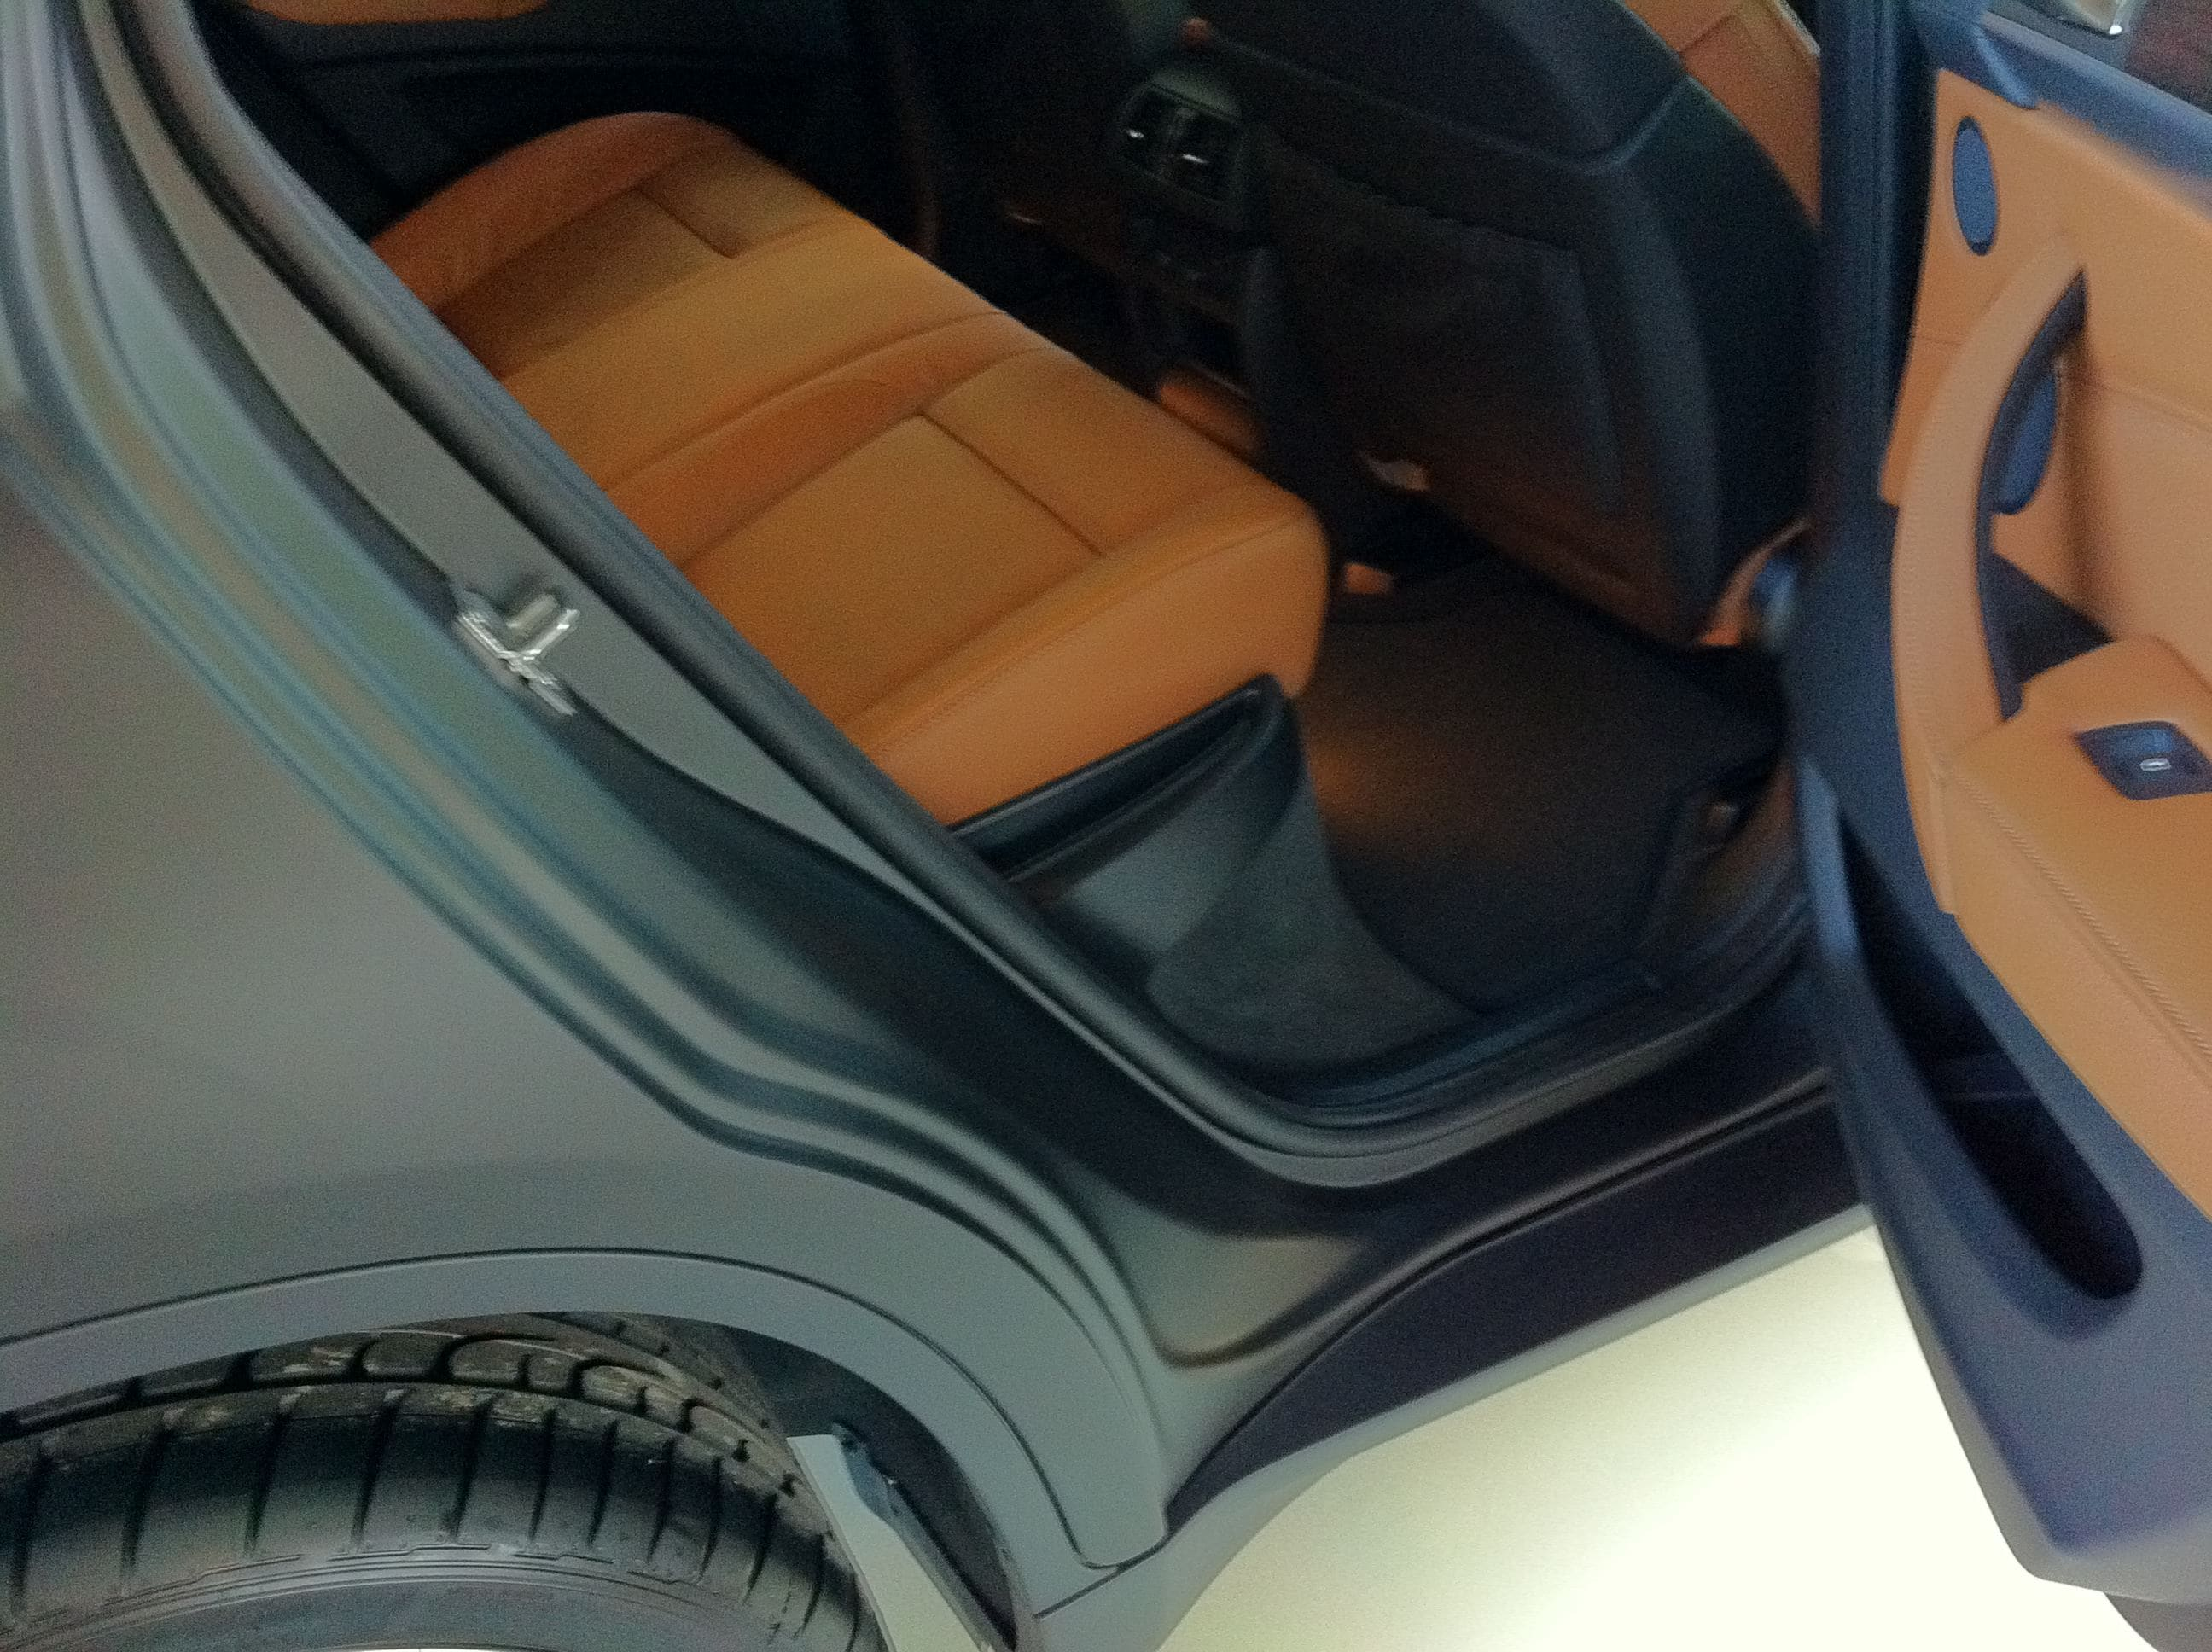 BMW X6 met Mat Zwarte Wrap, Carwrapping door Wrapmyride.nu Foto-nr:5492, ©2020